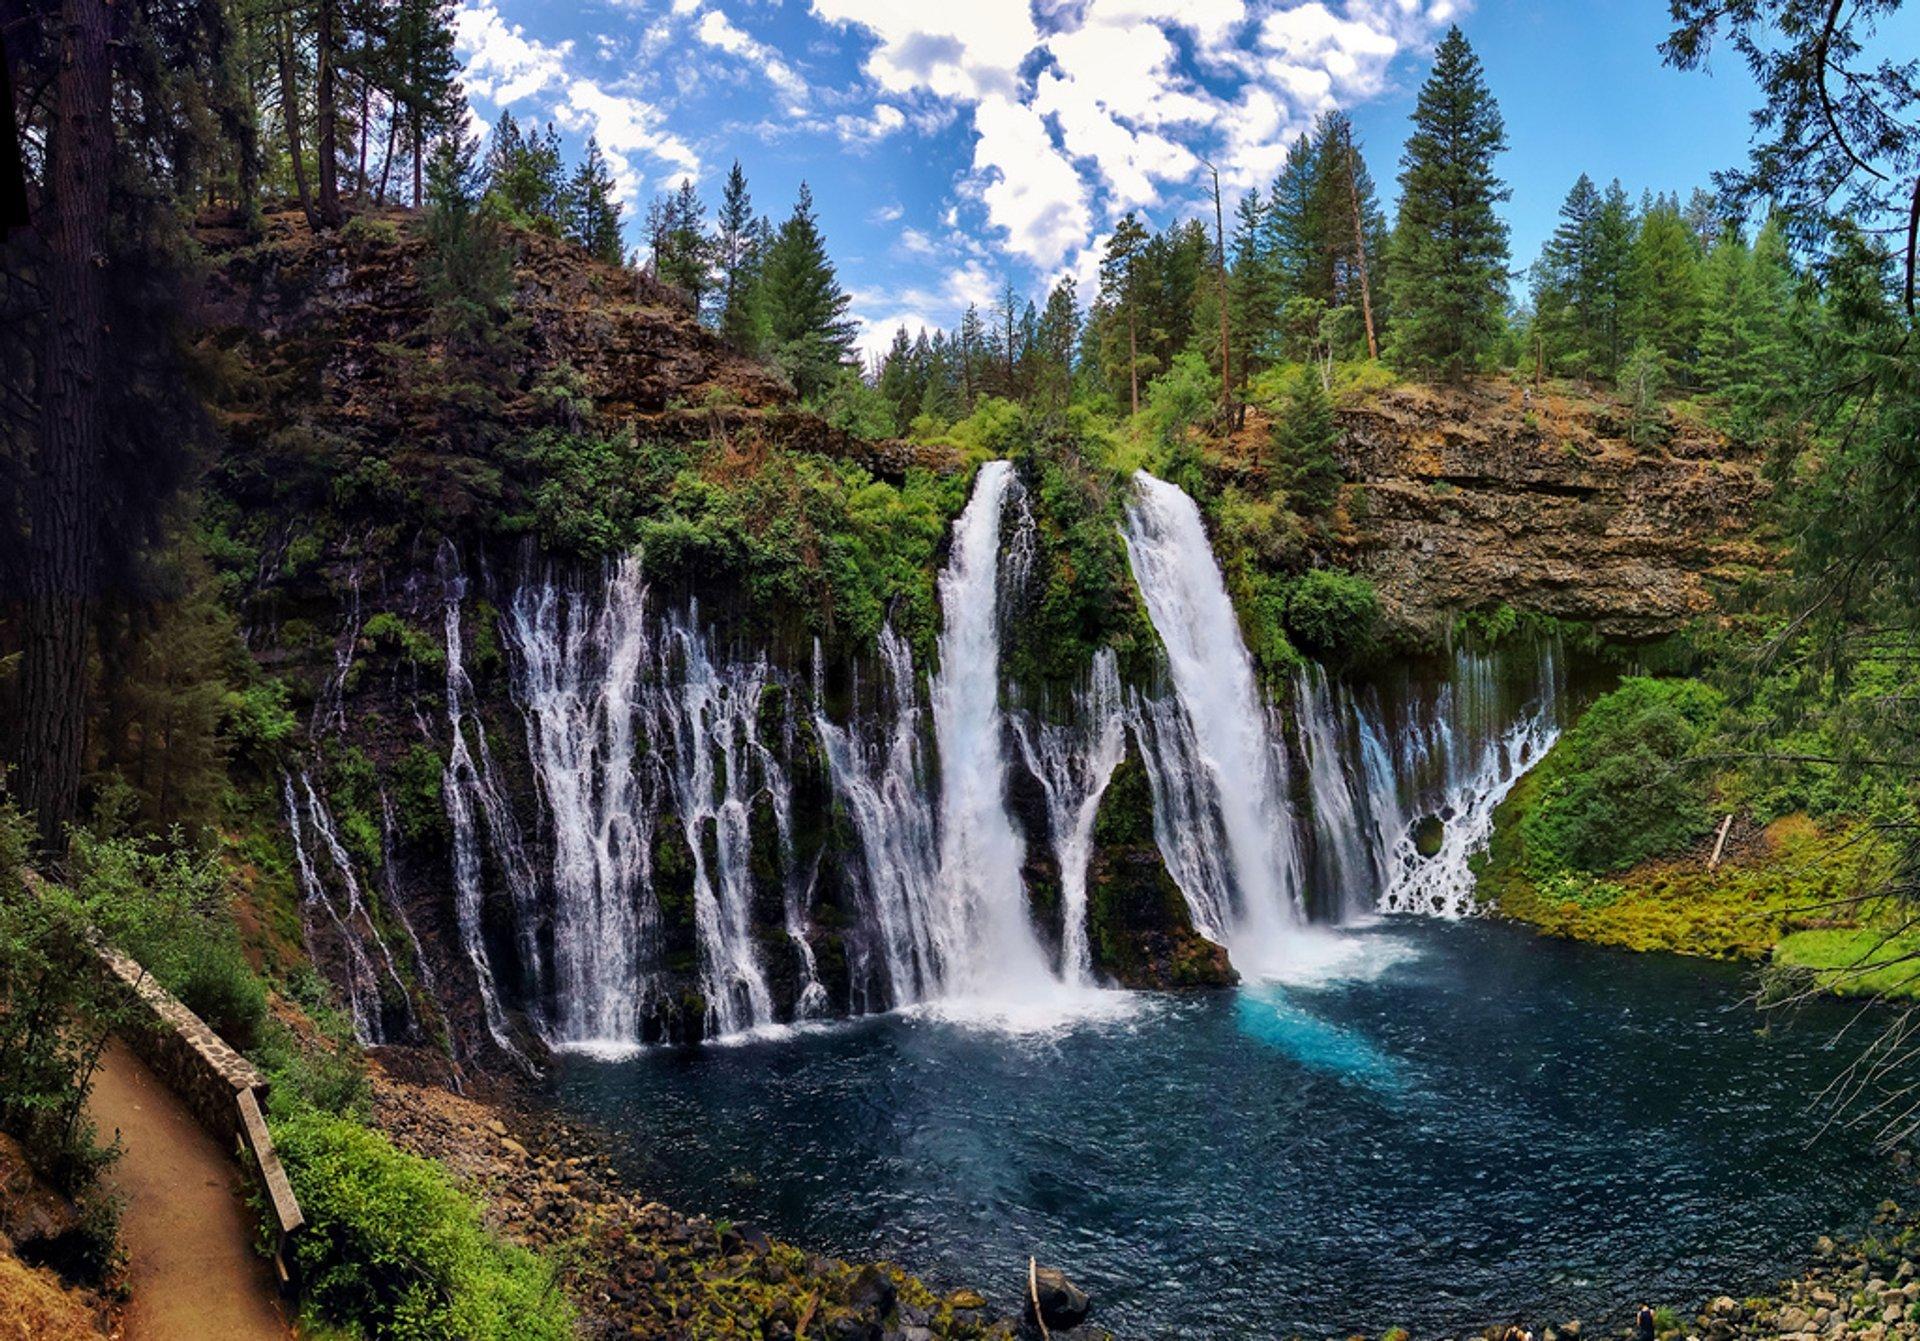 Burney Falls in California 2020 - Best Time